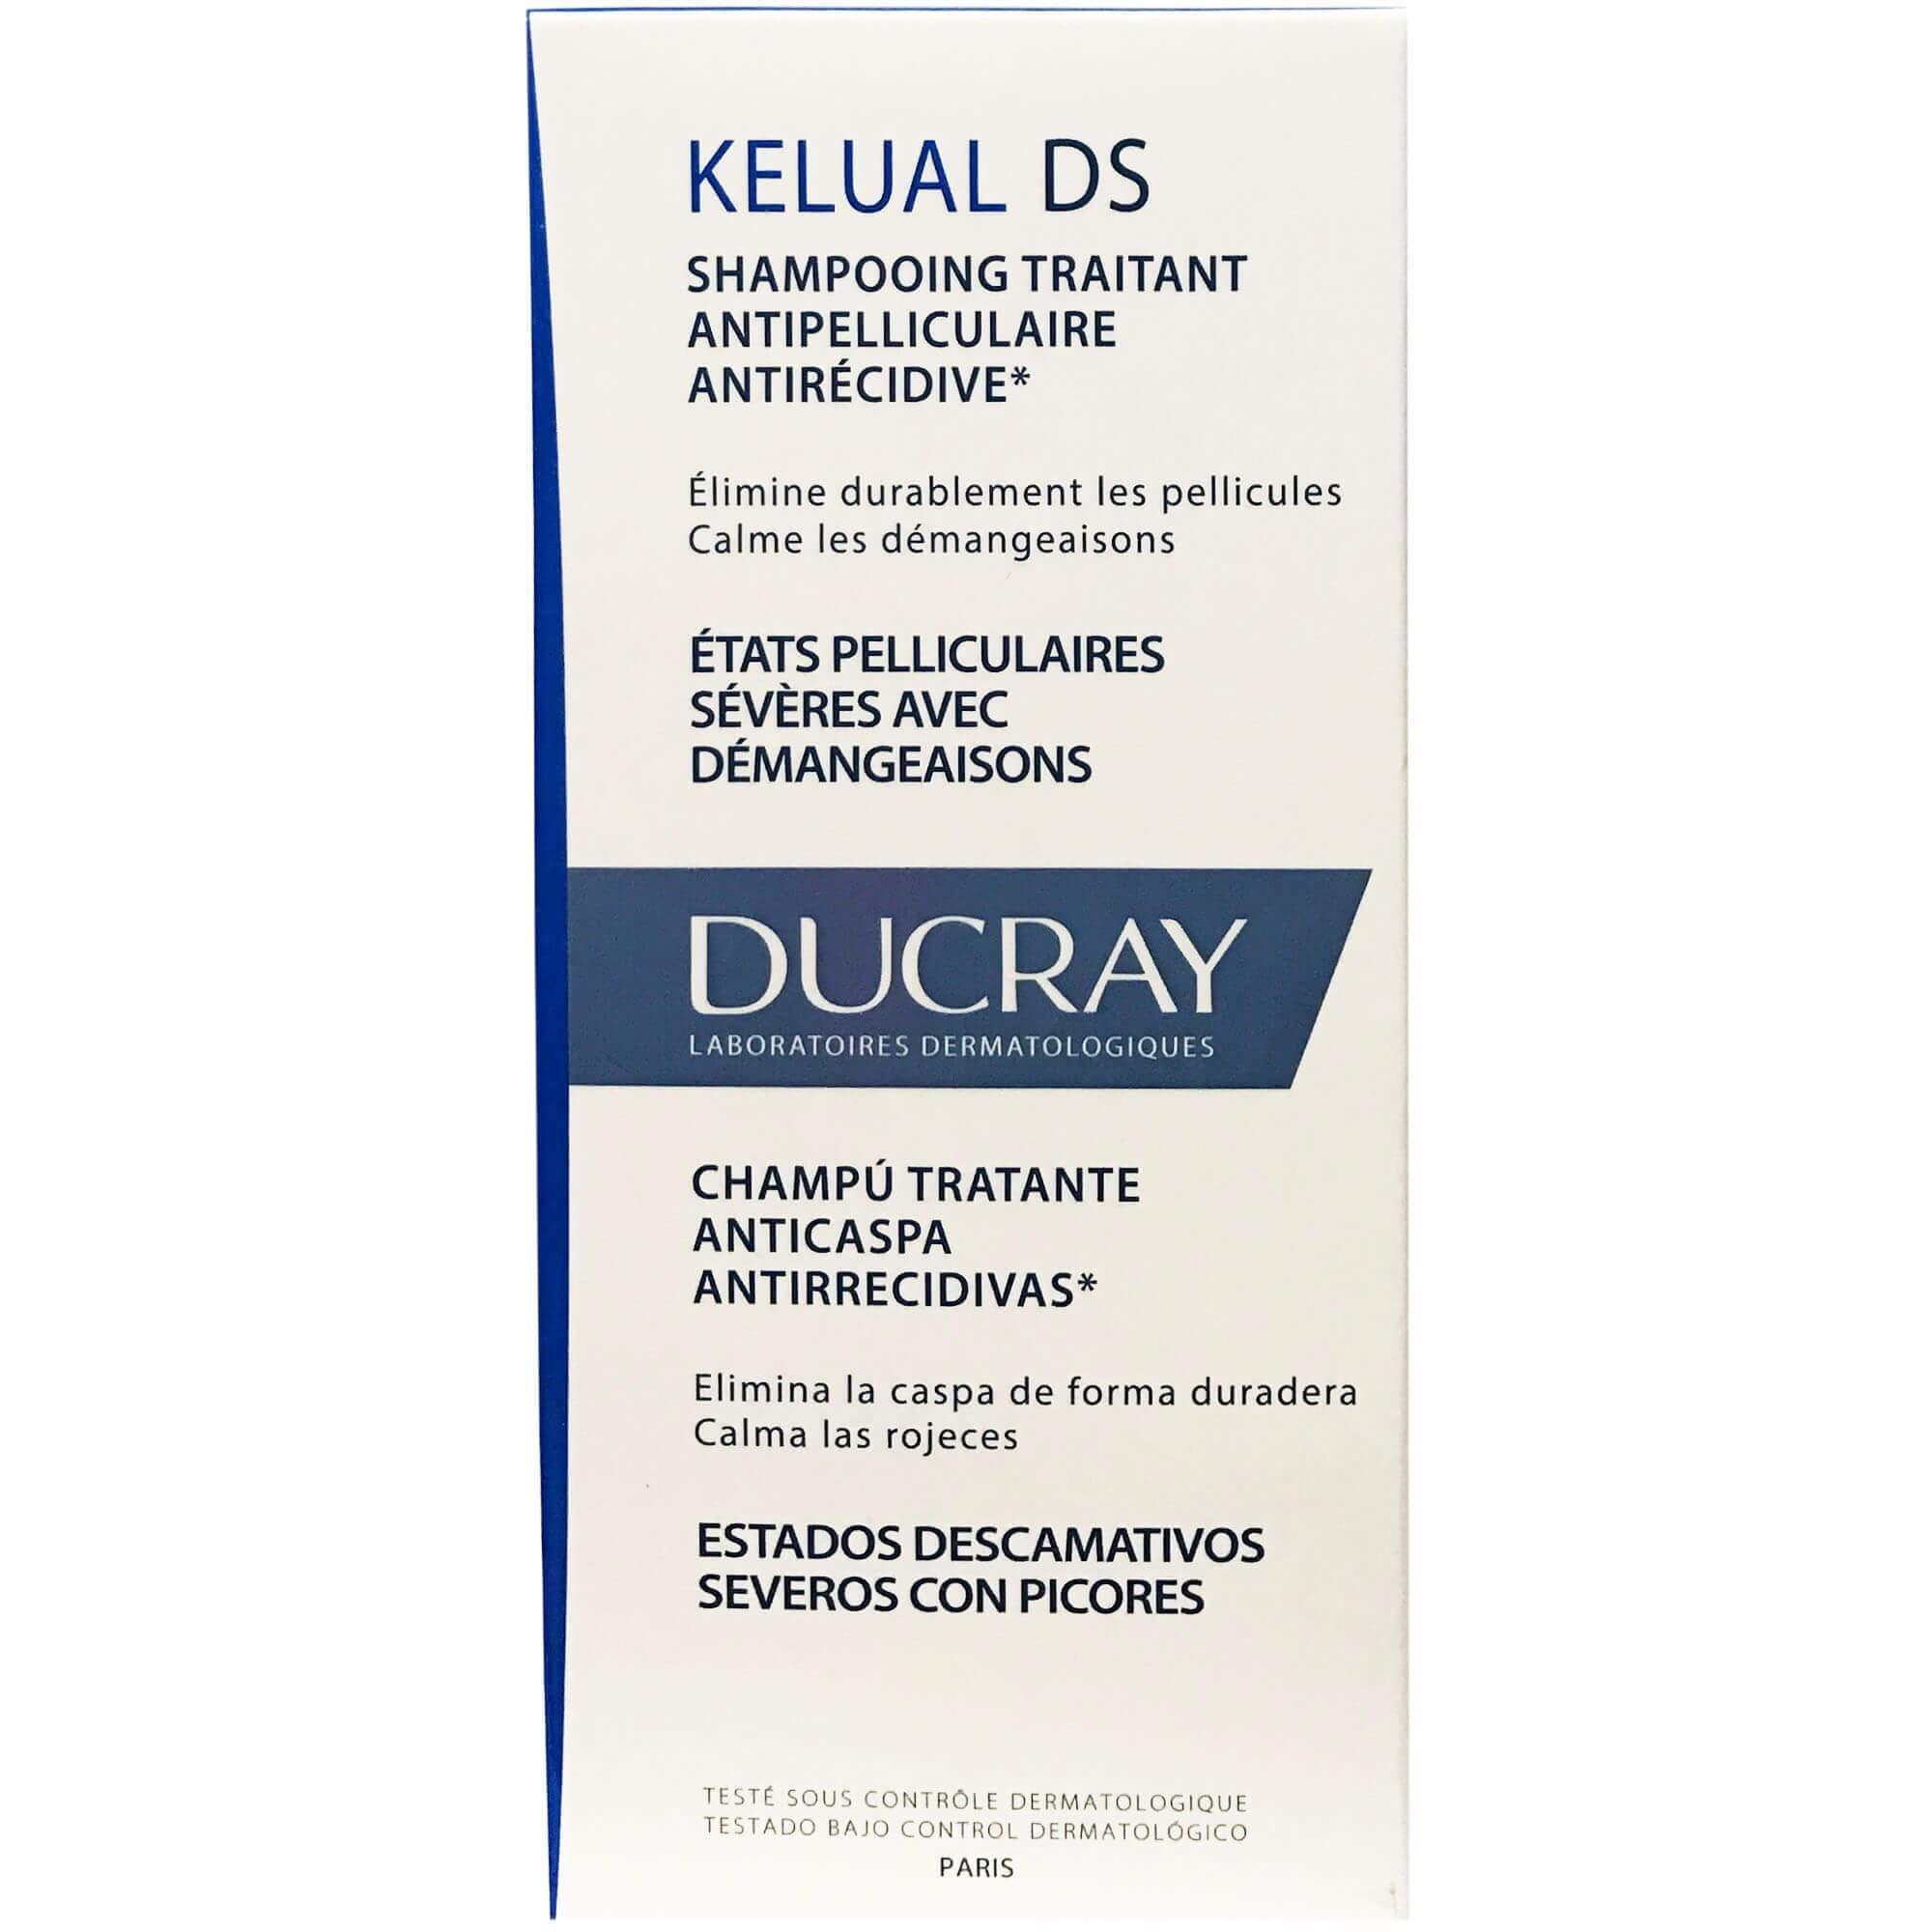 Ducray Kelual DS Shampooing Traintant Σαμπουάν Αγωγής Κατά της Πιτυρίδας 100ml Promo -15%